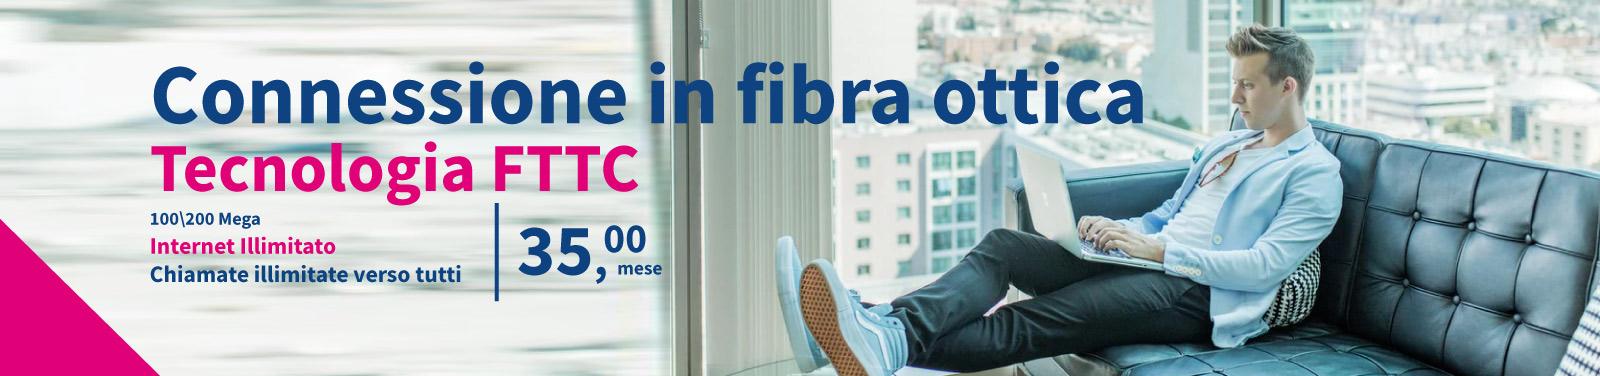 fttc fibra 100-200 mega